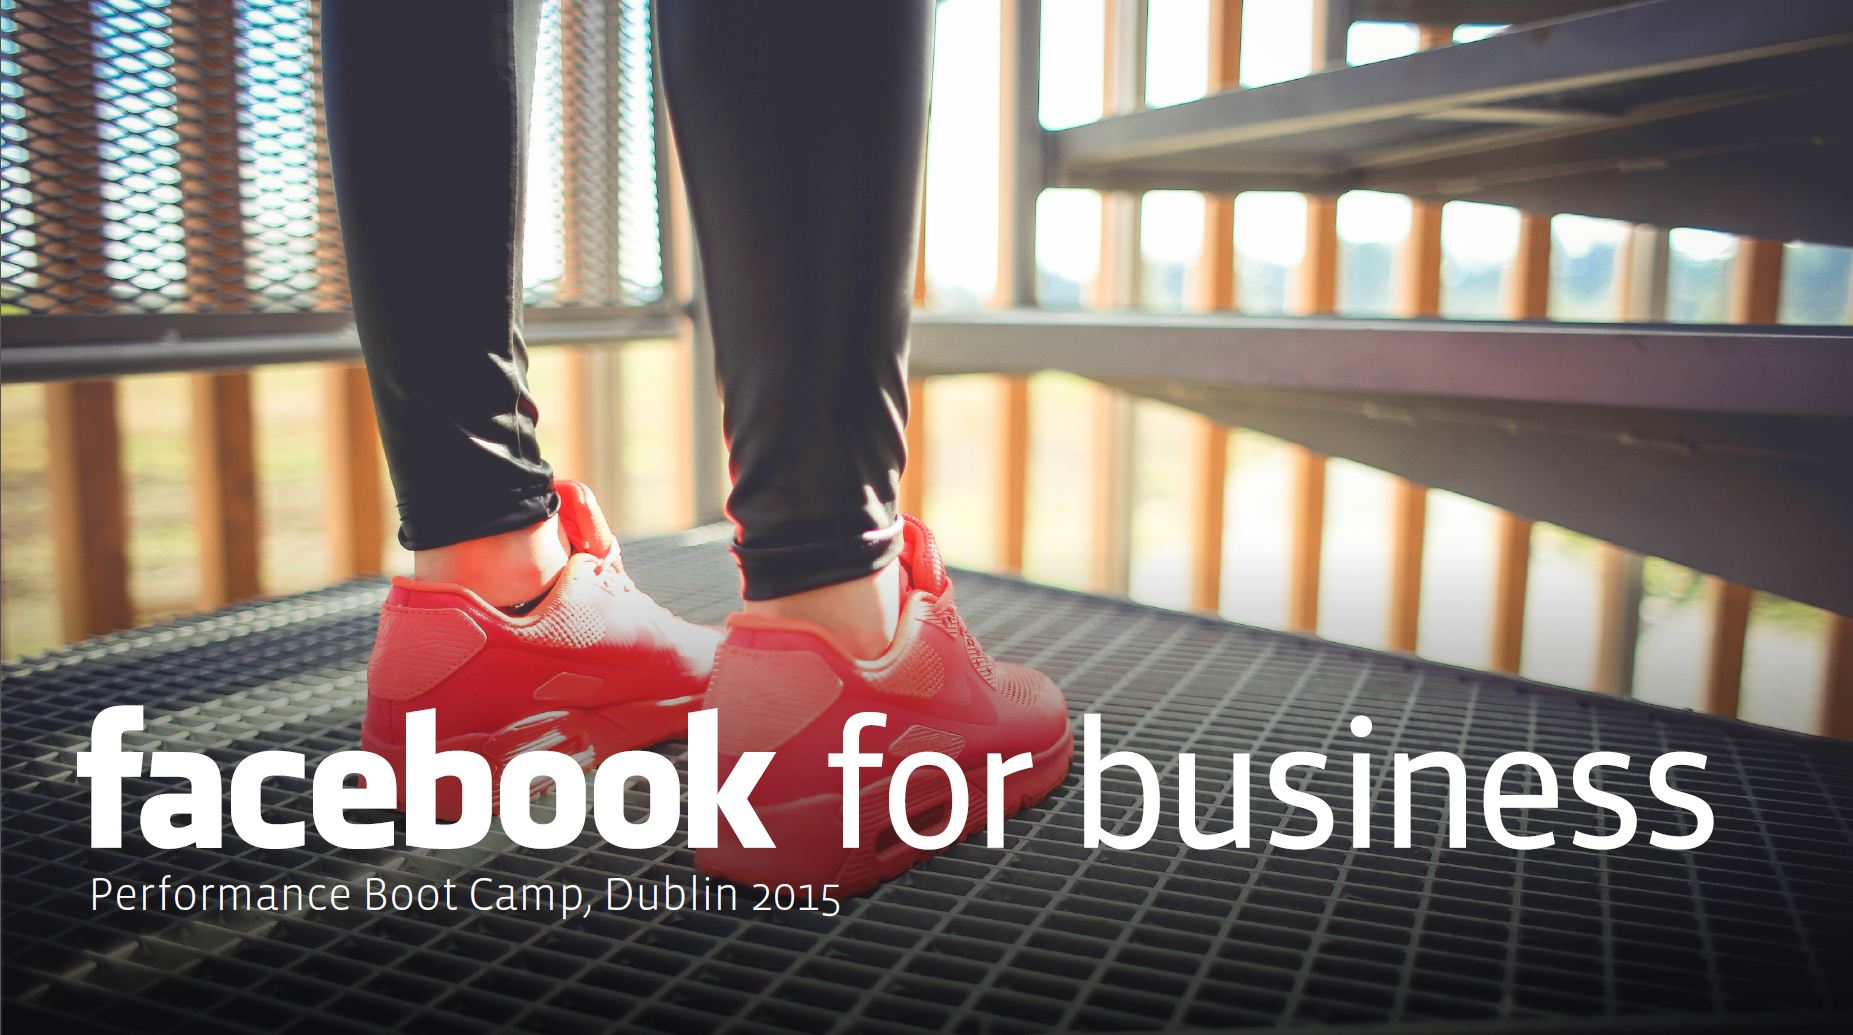 Facebook Performance Boot Camp in Dublin